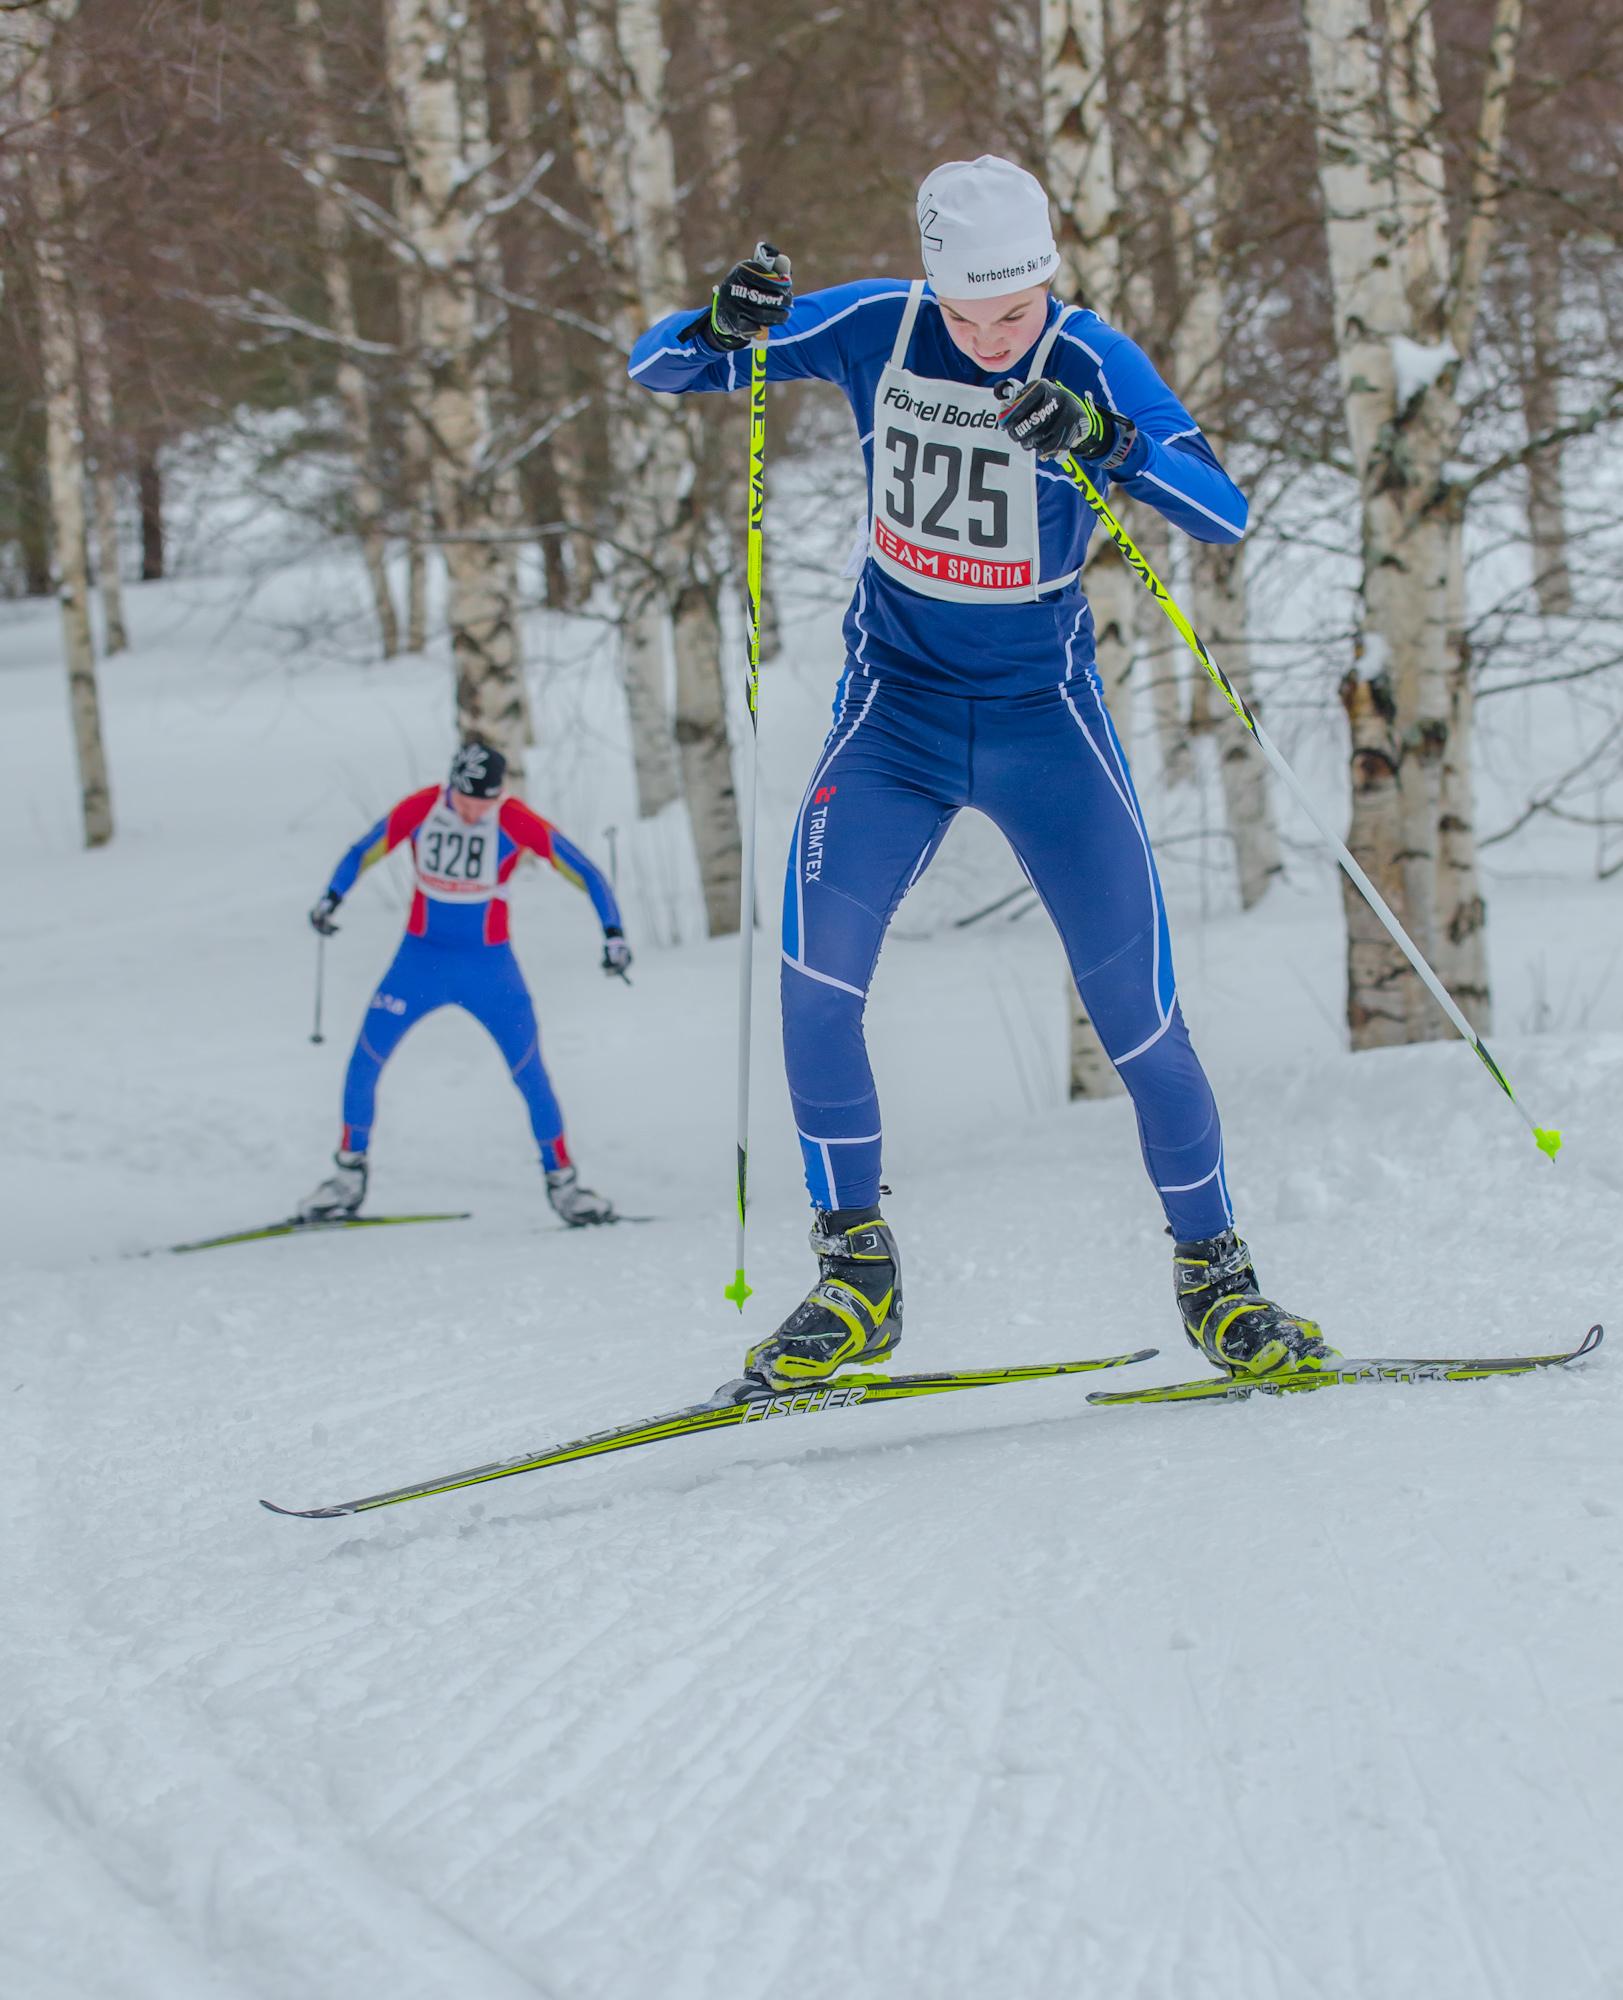 Andre Mattei, Sävastspelen 2014